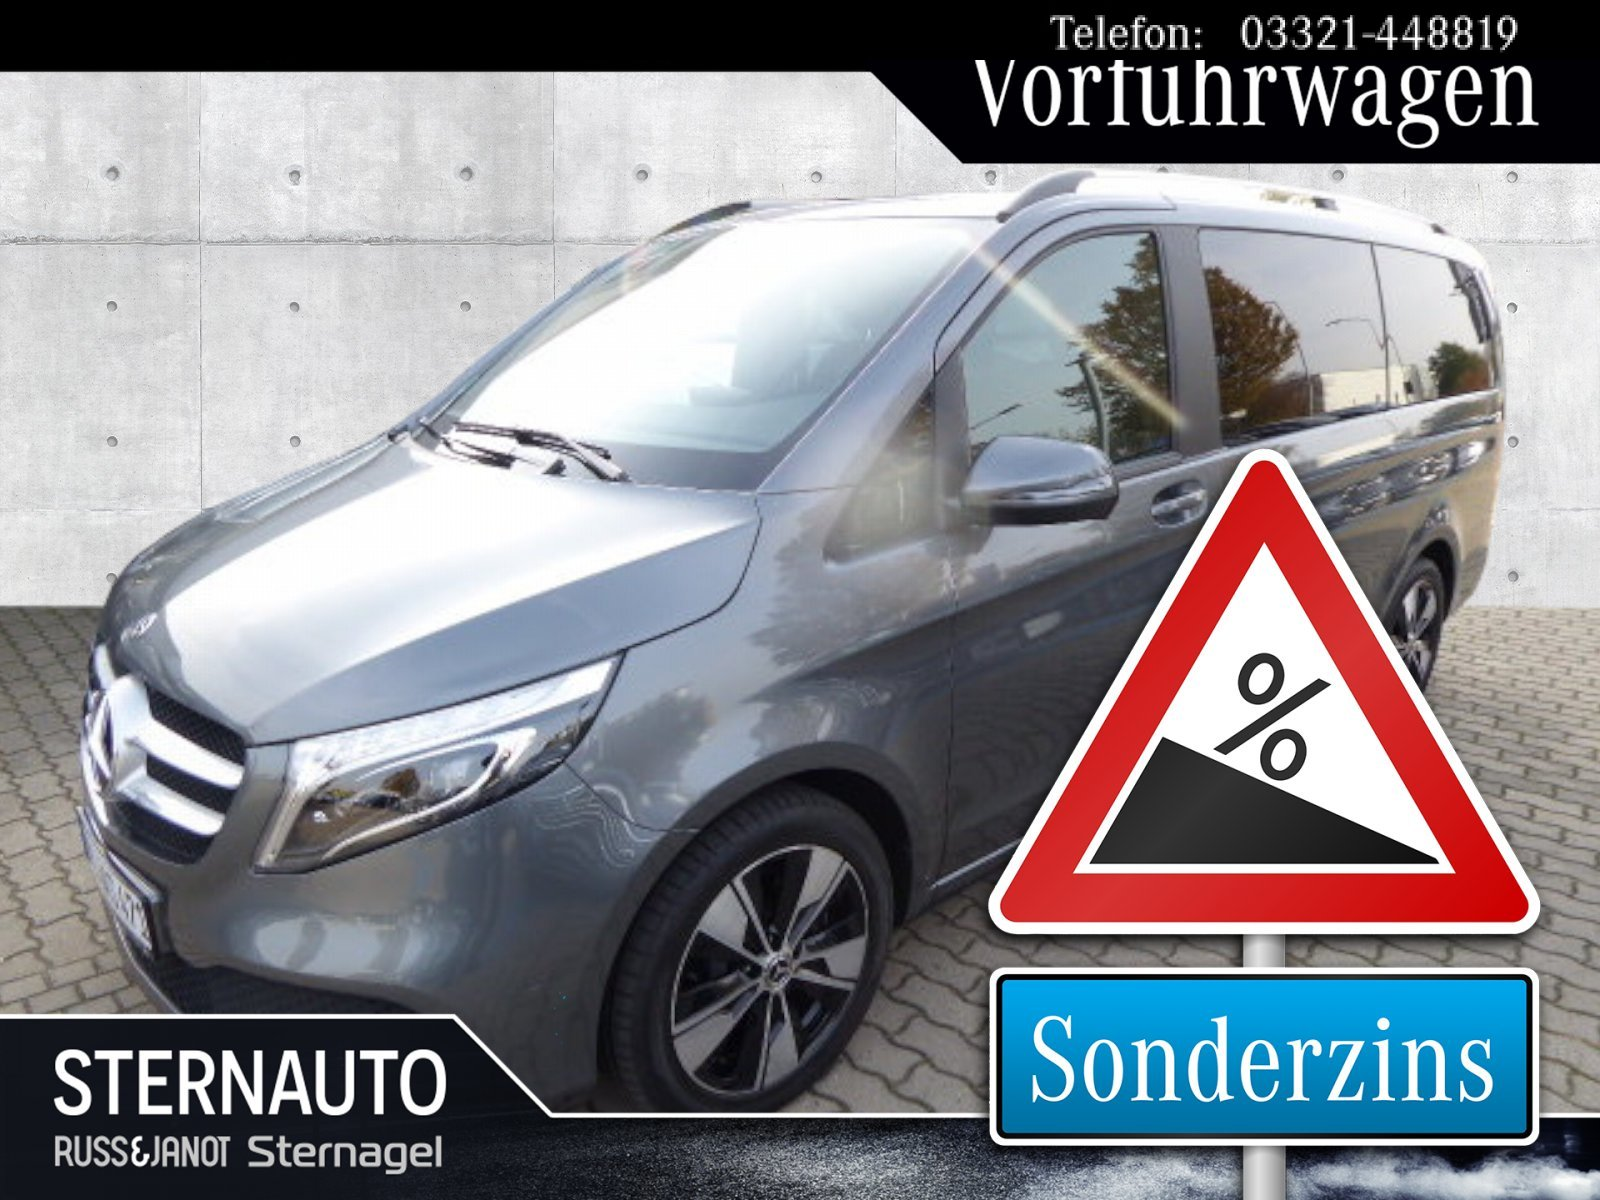 Mercedes-Benz V 300 d EDITION Lang LED-ILS/COMMAND/Tempomat, Jahr 2019, Diesel